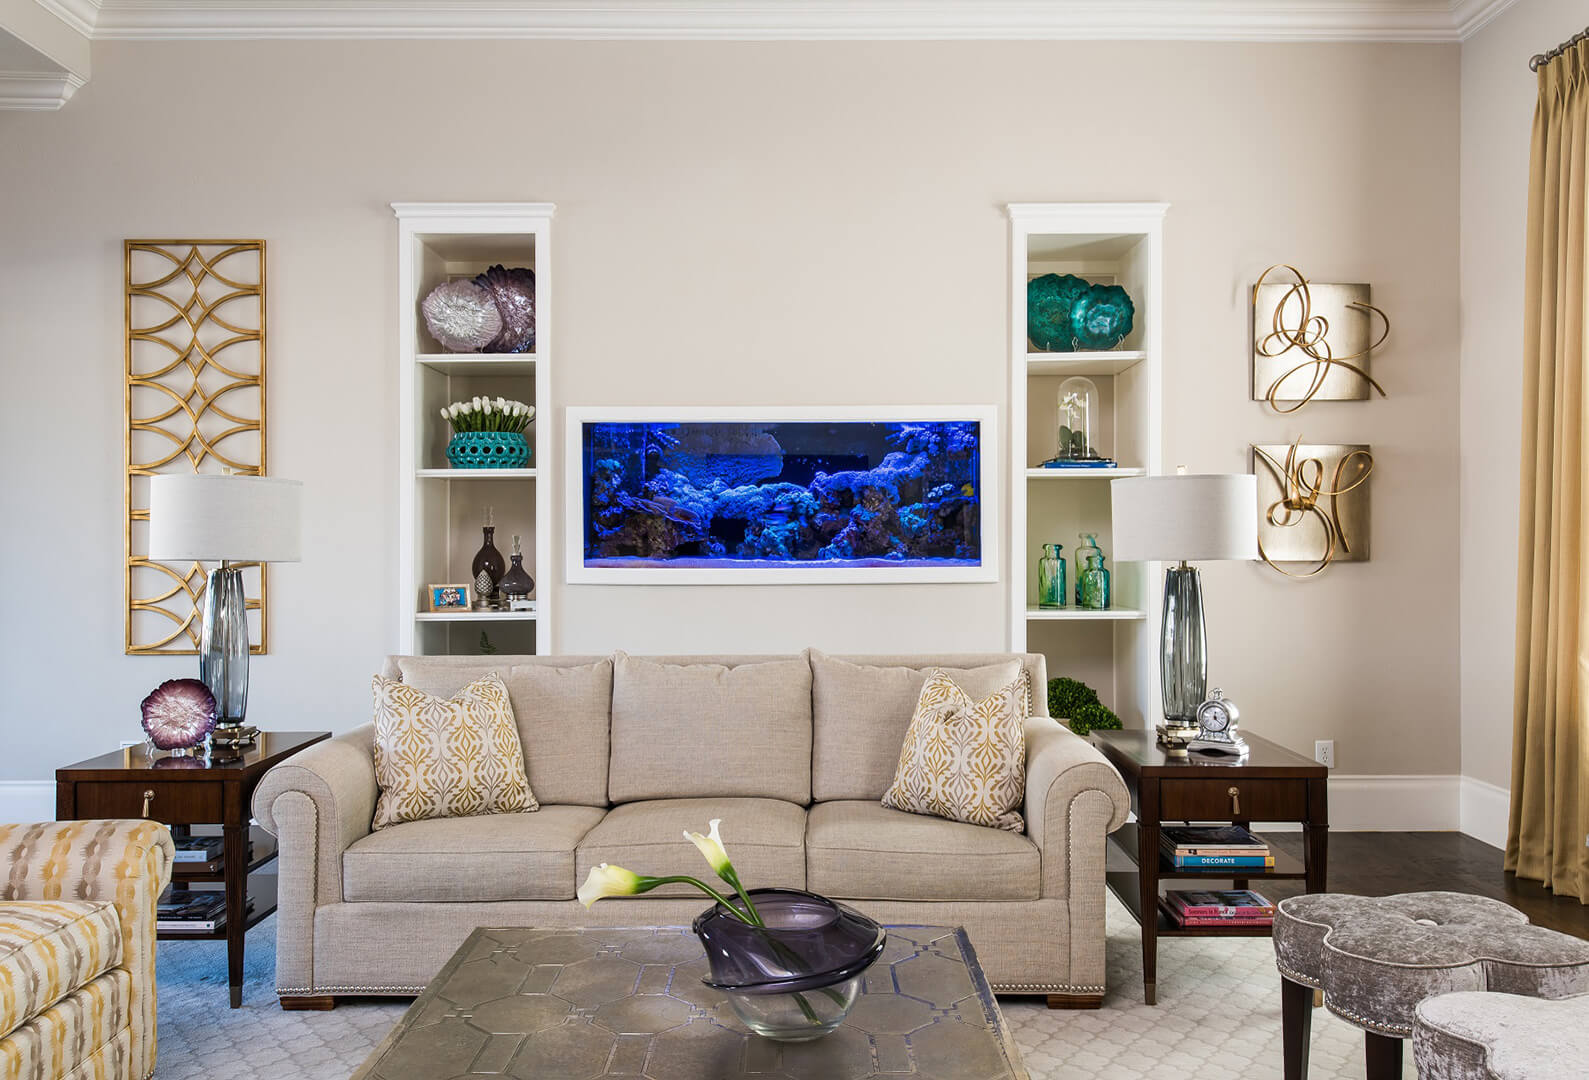 beautiful living room ideas with interior design with aquarium in family room by best interior designers dallas TX Dee Frazier Interiors Decorating Den Interiors the best Frisco Interior Designer